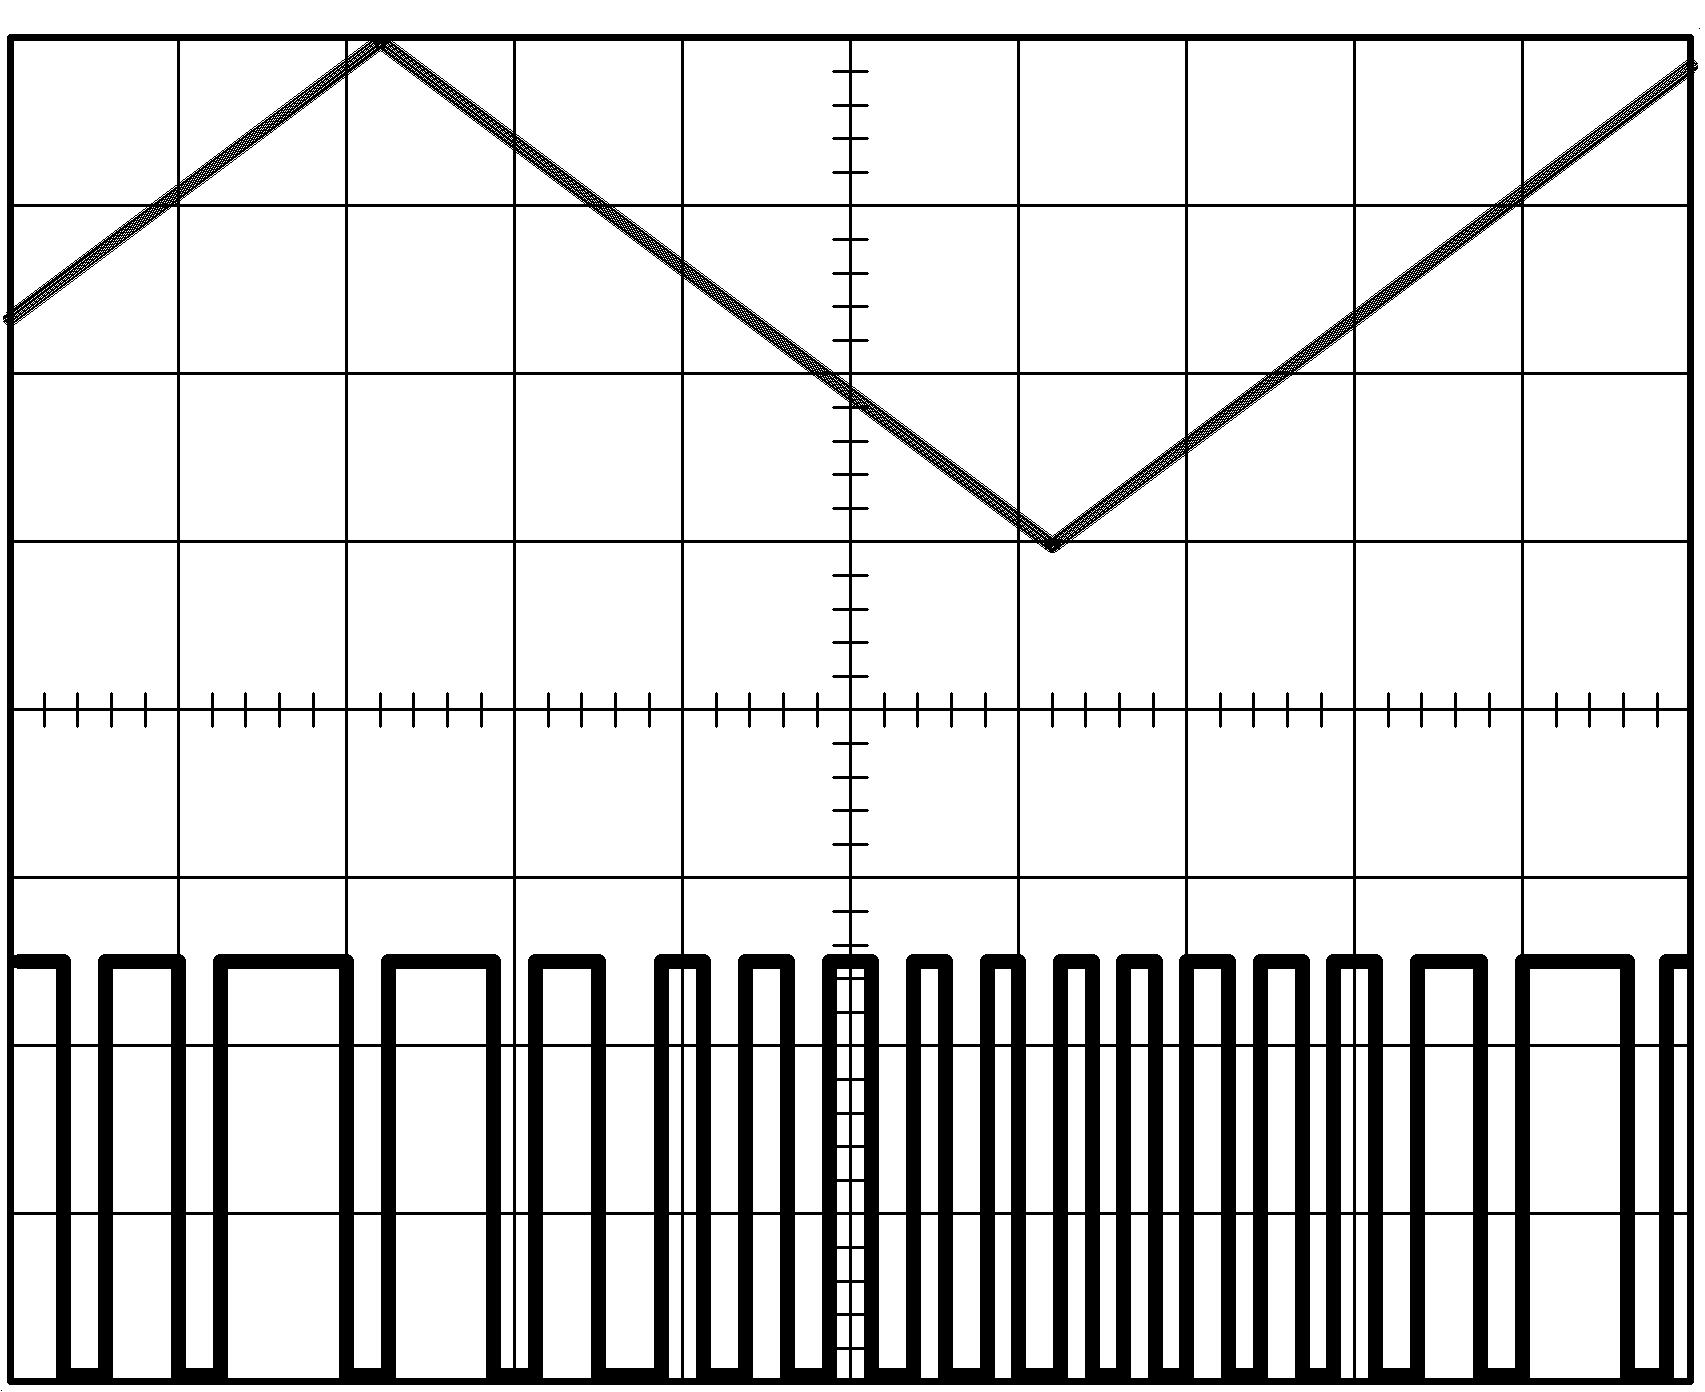 Lmc555 555timermonostableoneshotcircuit 952 Application Curve